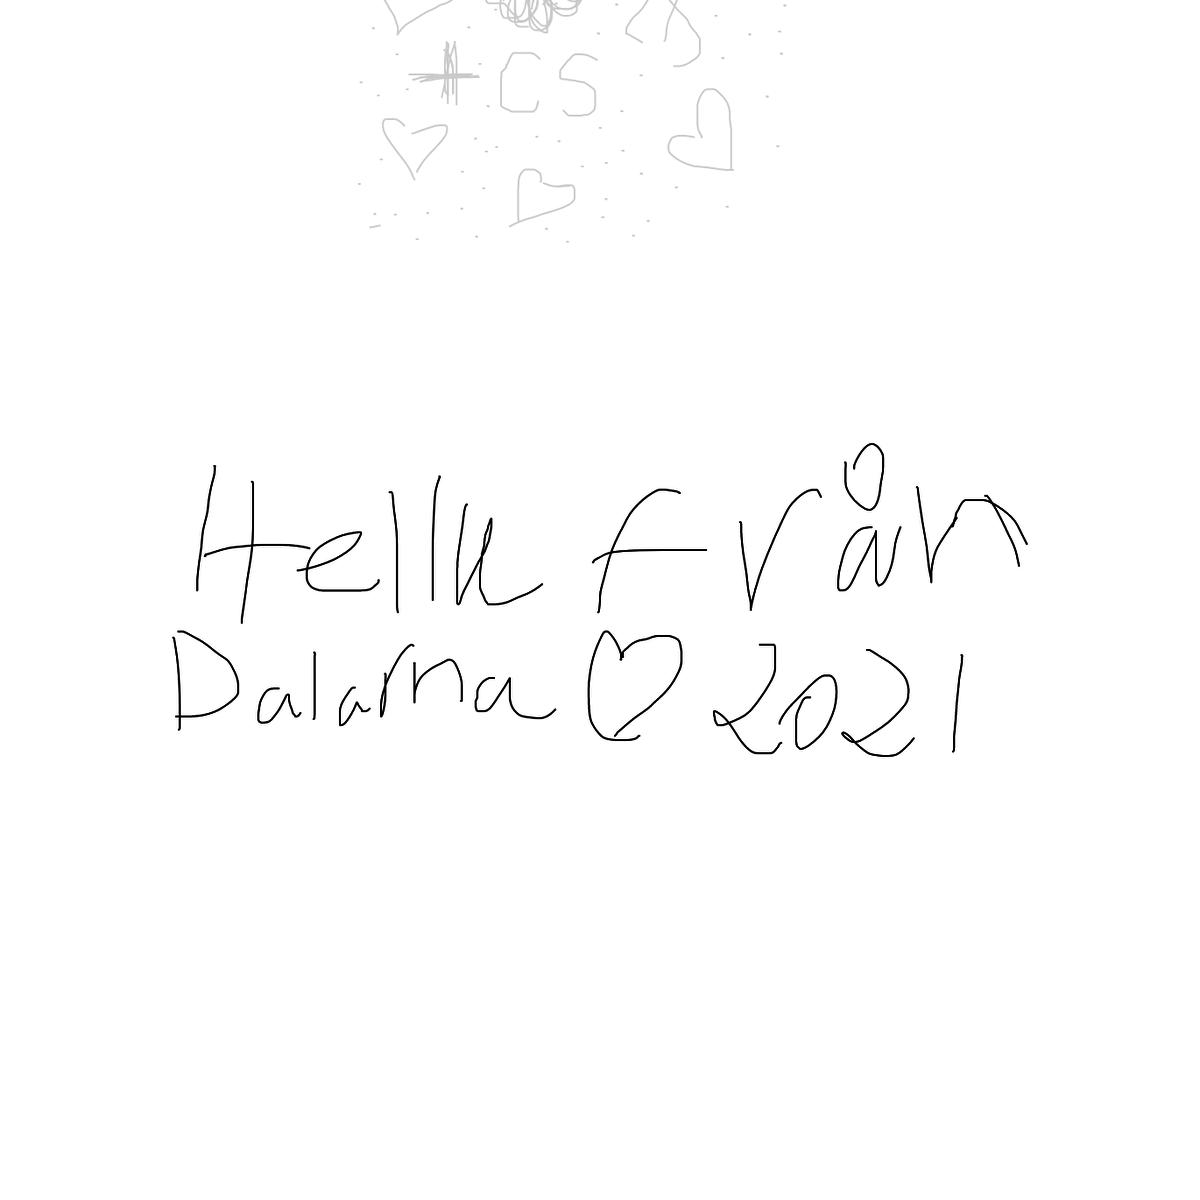 BAAAM drawing#24661 lat:57.7357368469238300lng: 12.9349431991577150